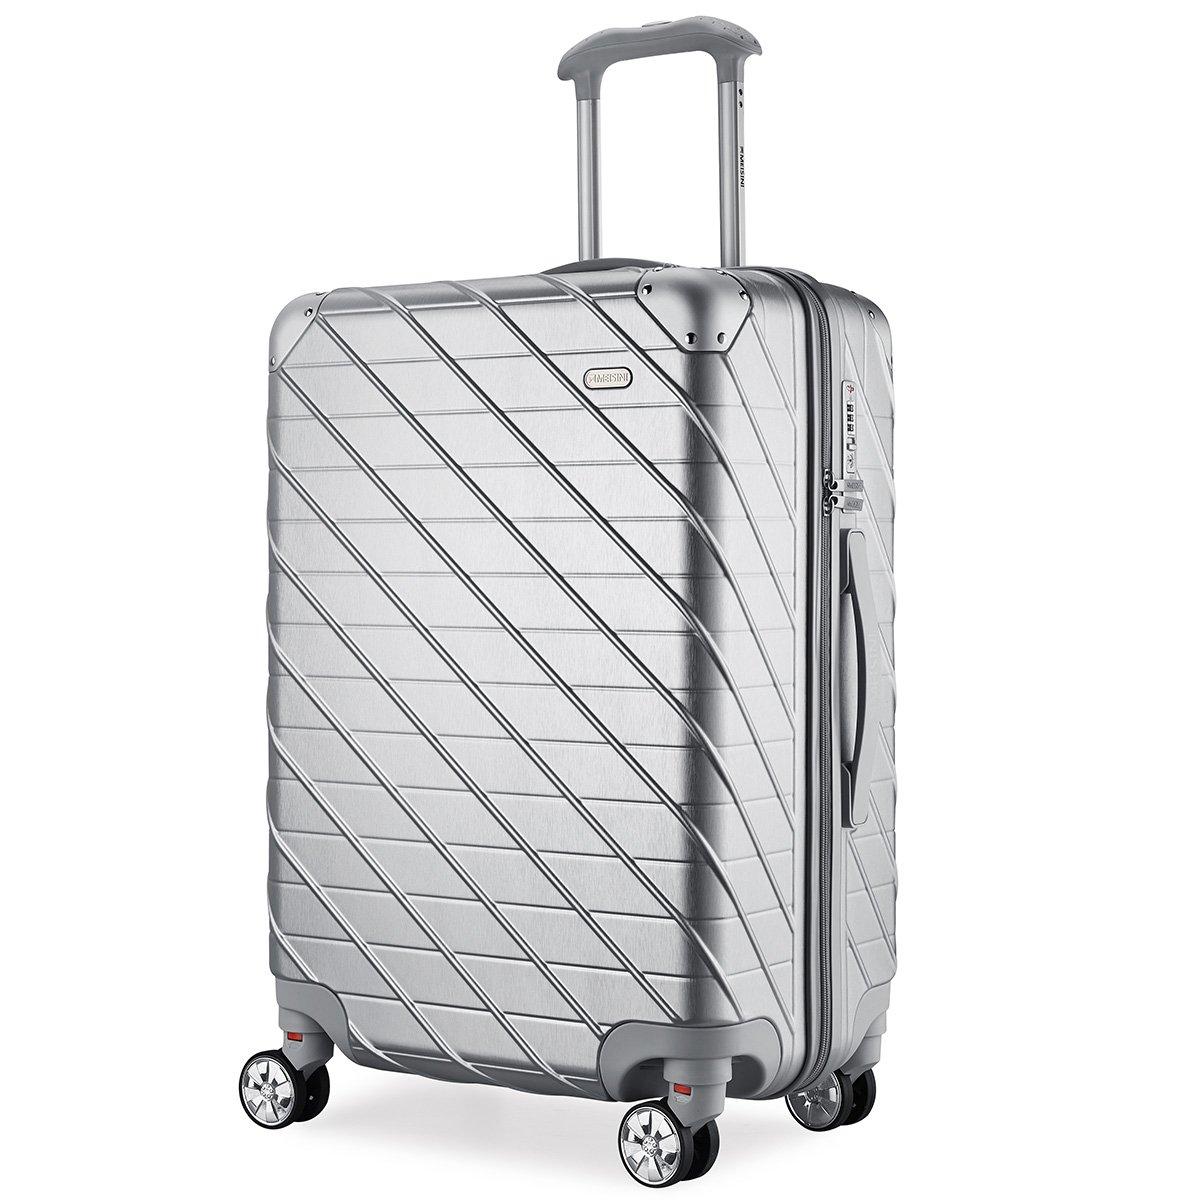 MEISINI スーツケース 旅行バッグ キャリーバッグ キャリーケース TSAロック 機内持込 軽量 ABS+PC 静音 ファスナーレス 8輪キャスター 出張【一年保証】 B07DJ34SH7 Mサイズ( 4~7泊用·62L)|シルバー シルバー Mサイズ( 4~7泊用·62L)